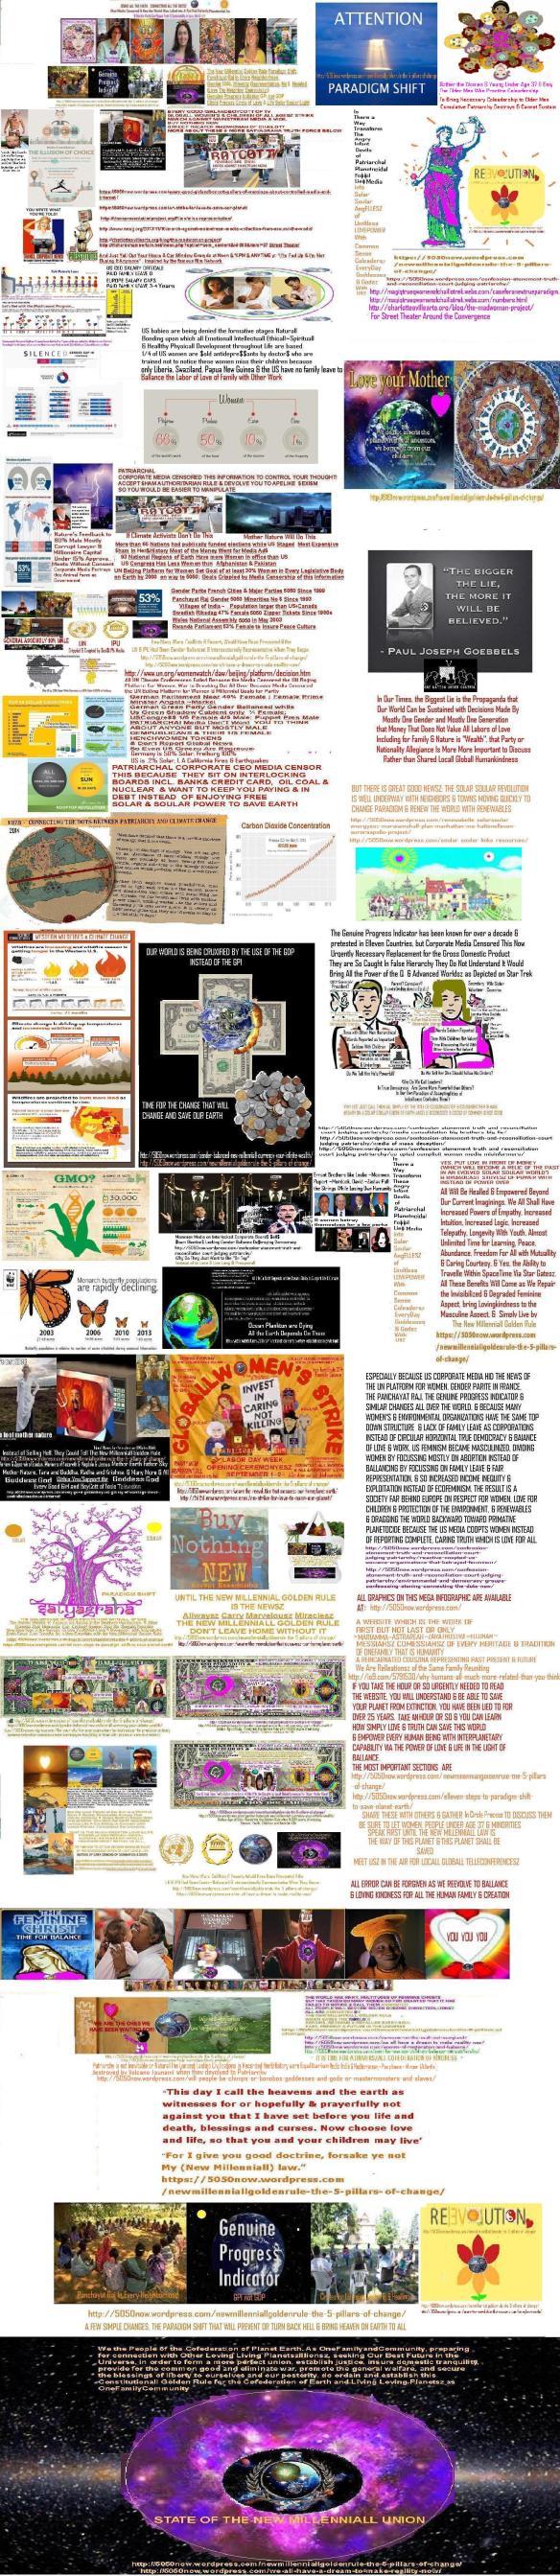 infographic1b